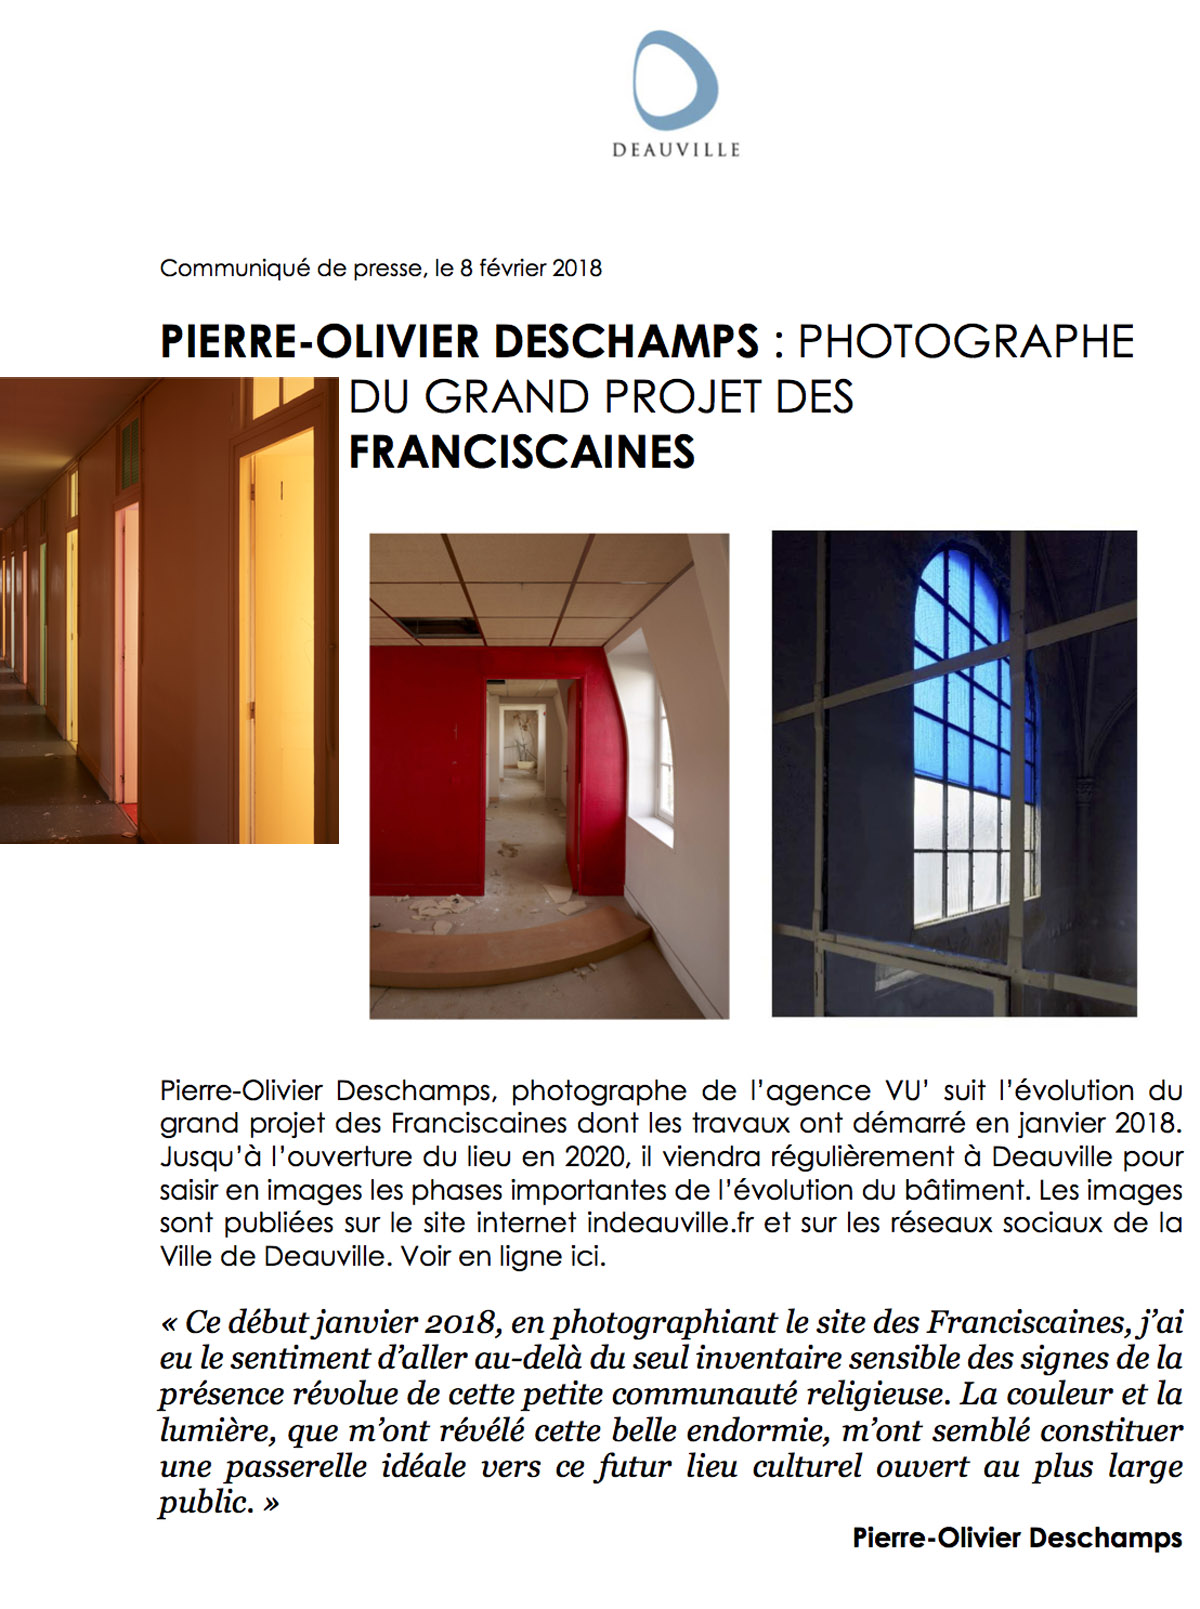 20180210 - CP photographe Franciscaines.jpg